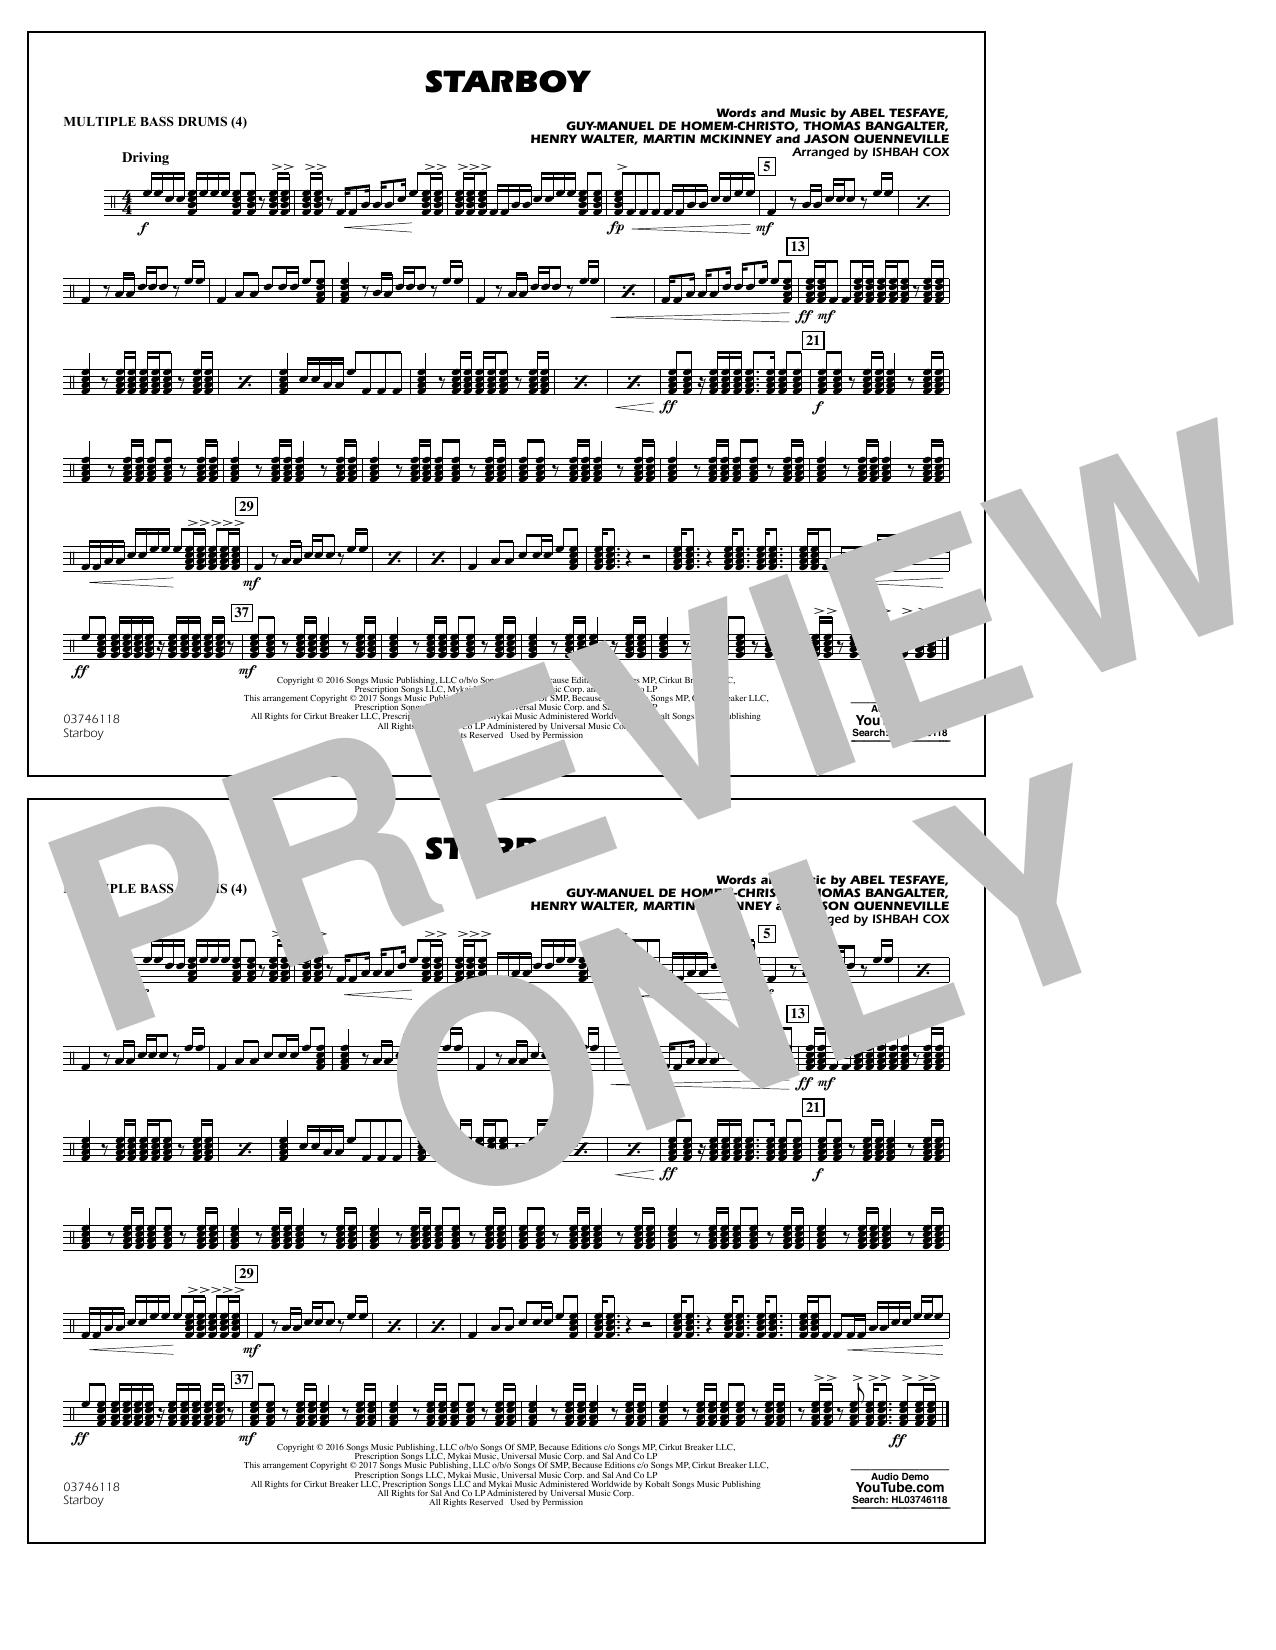 Starboy - Multiple Bass Drums Sheet Music